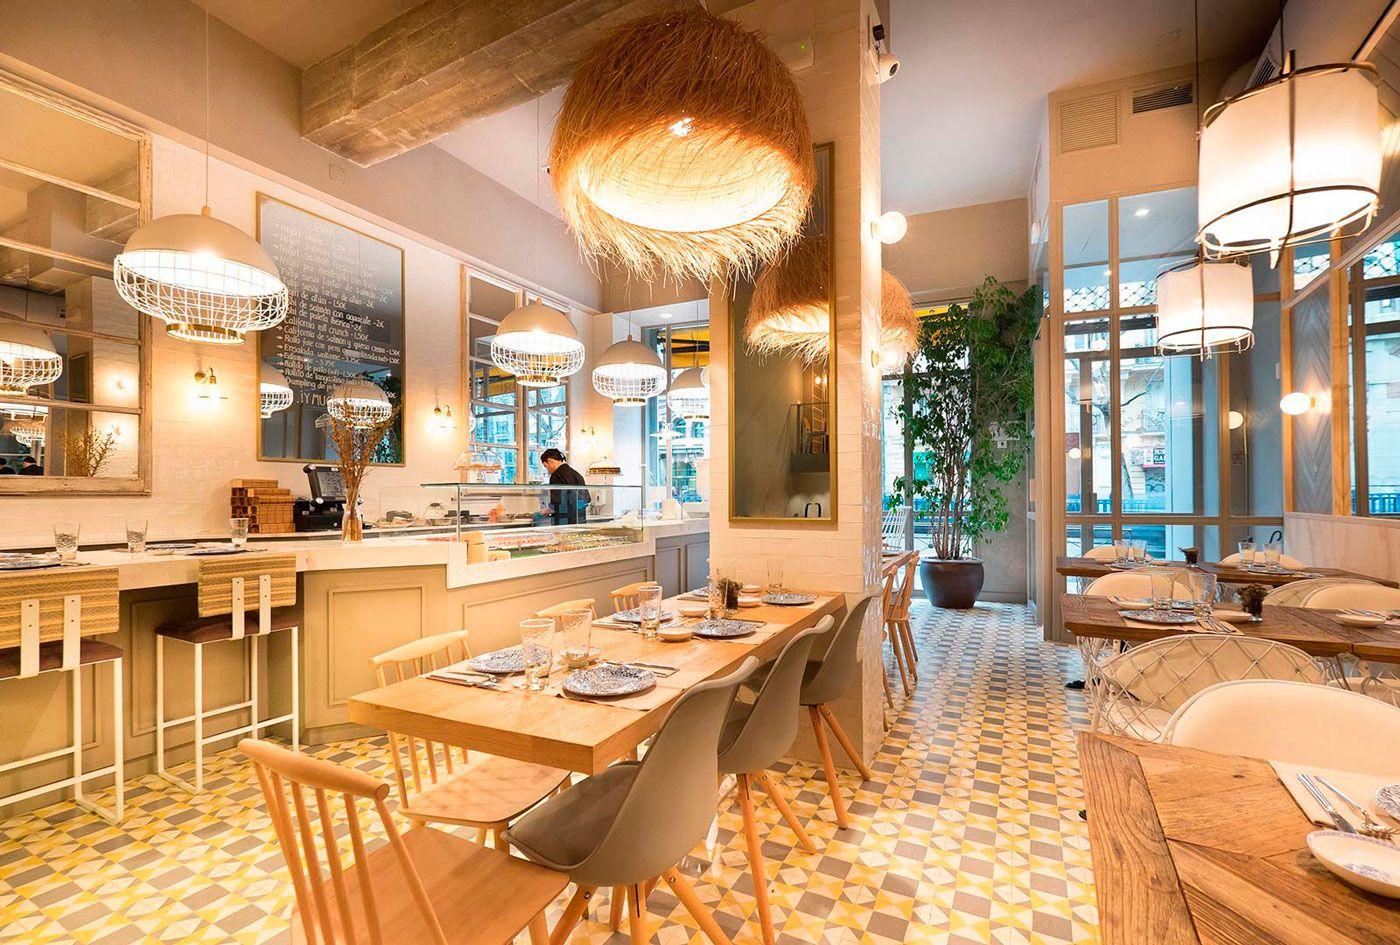 Sushita Cafe Ad Espana C Sushita Cafe Bar Restaurant Interior